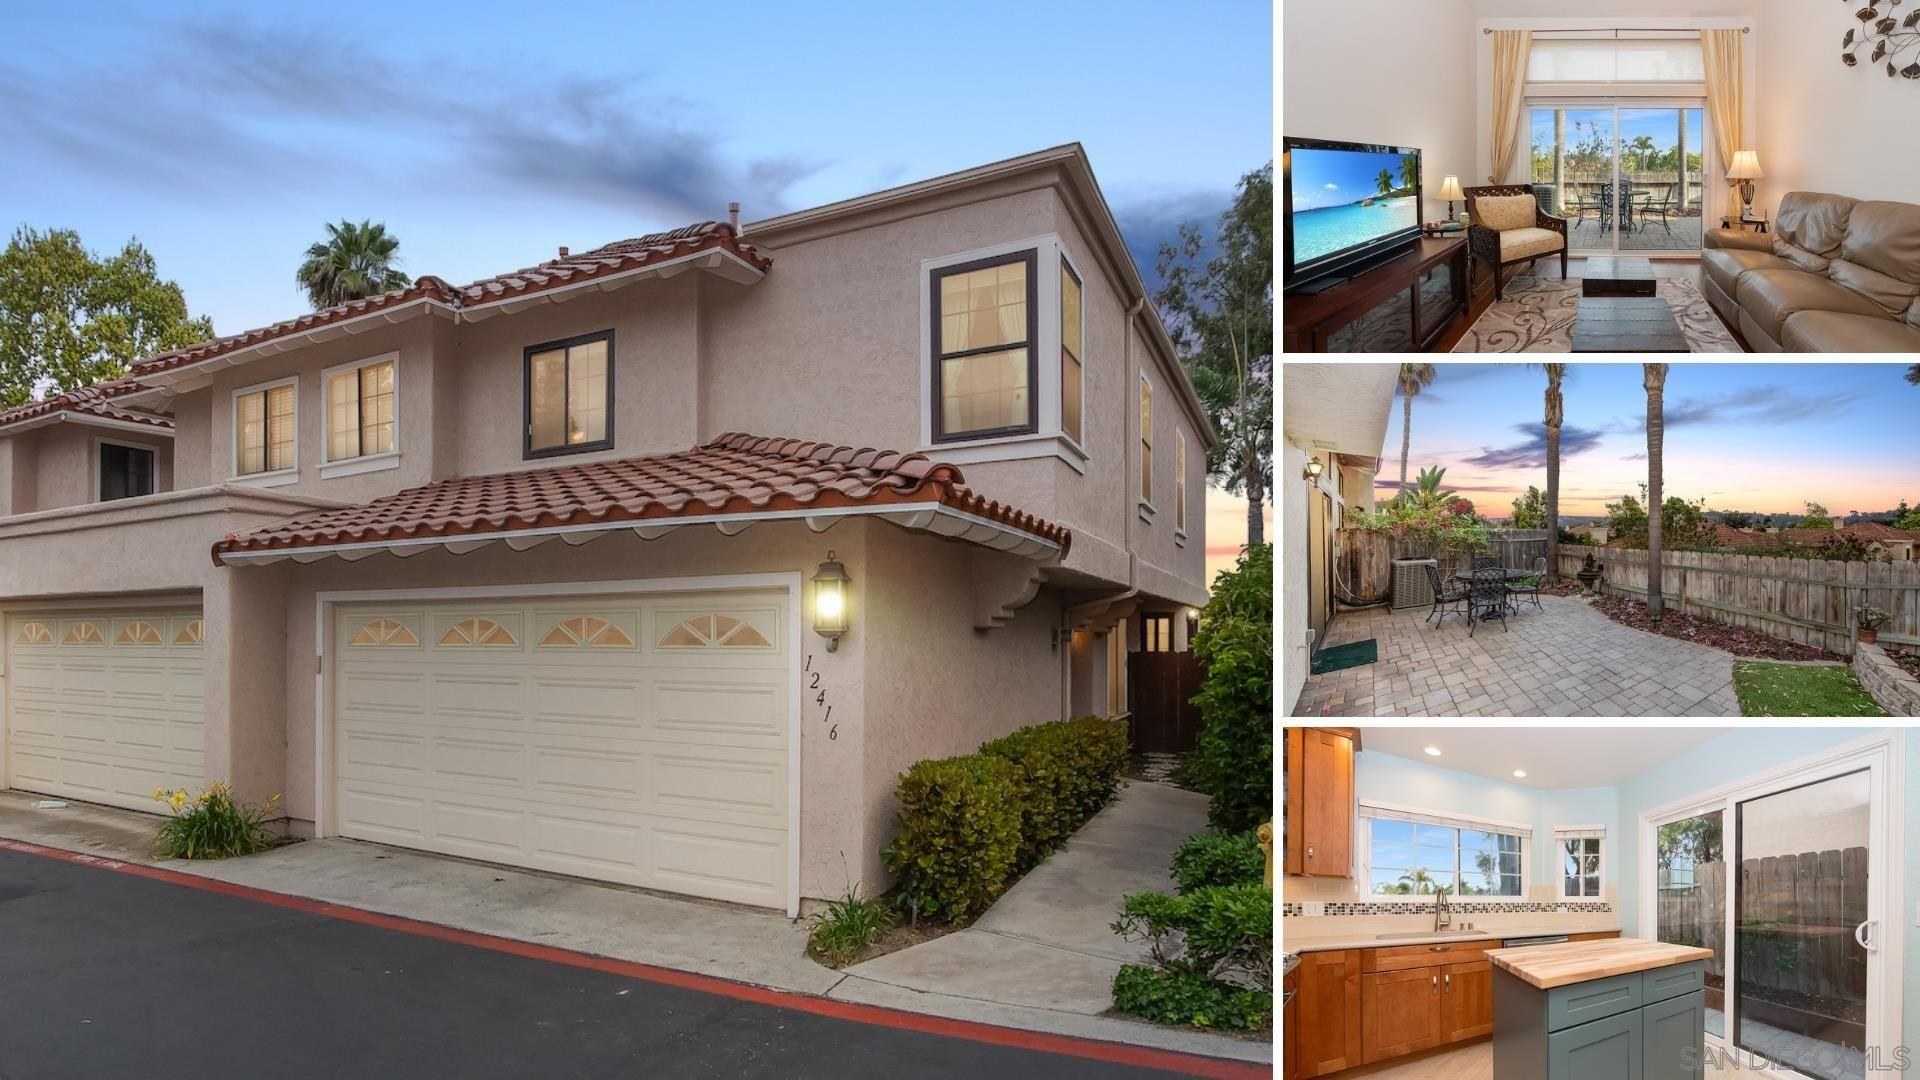 Main Photo: CARMEL VALLEY Condo for sale : 3 bedrooms : 12416 Caminito Mira Del Mar in San Diego